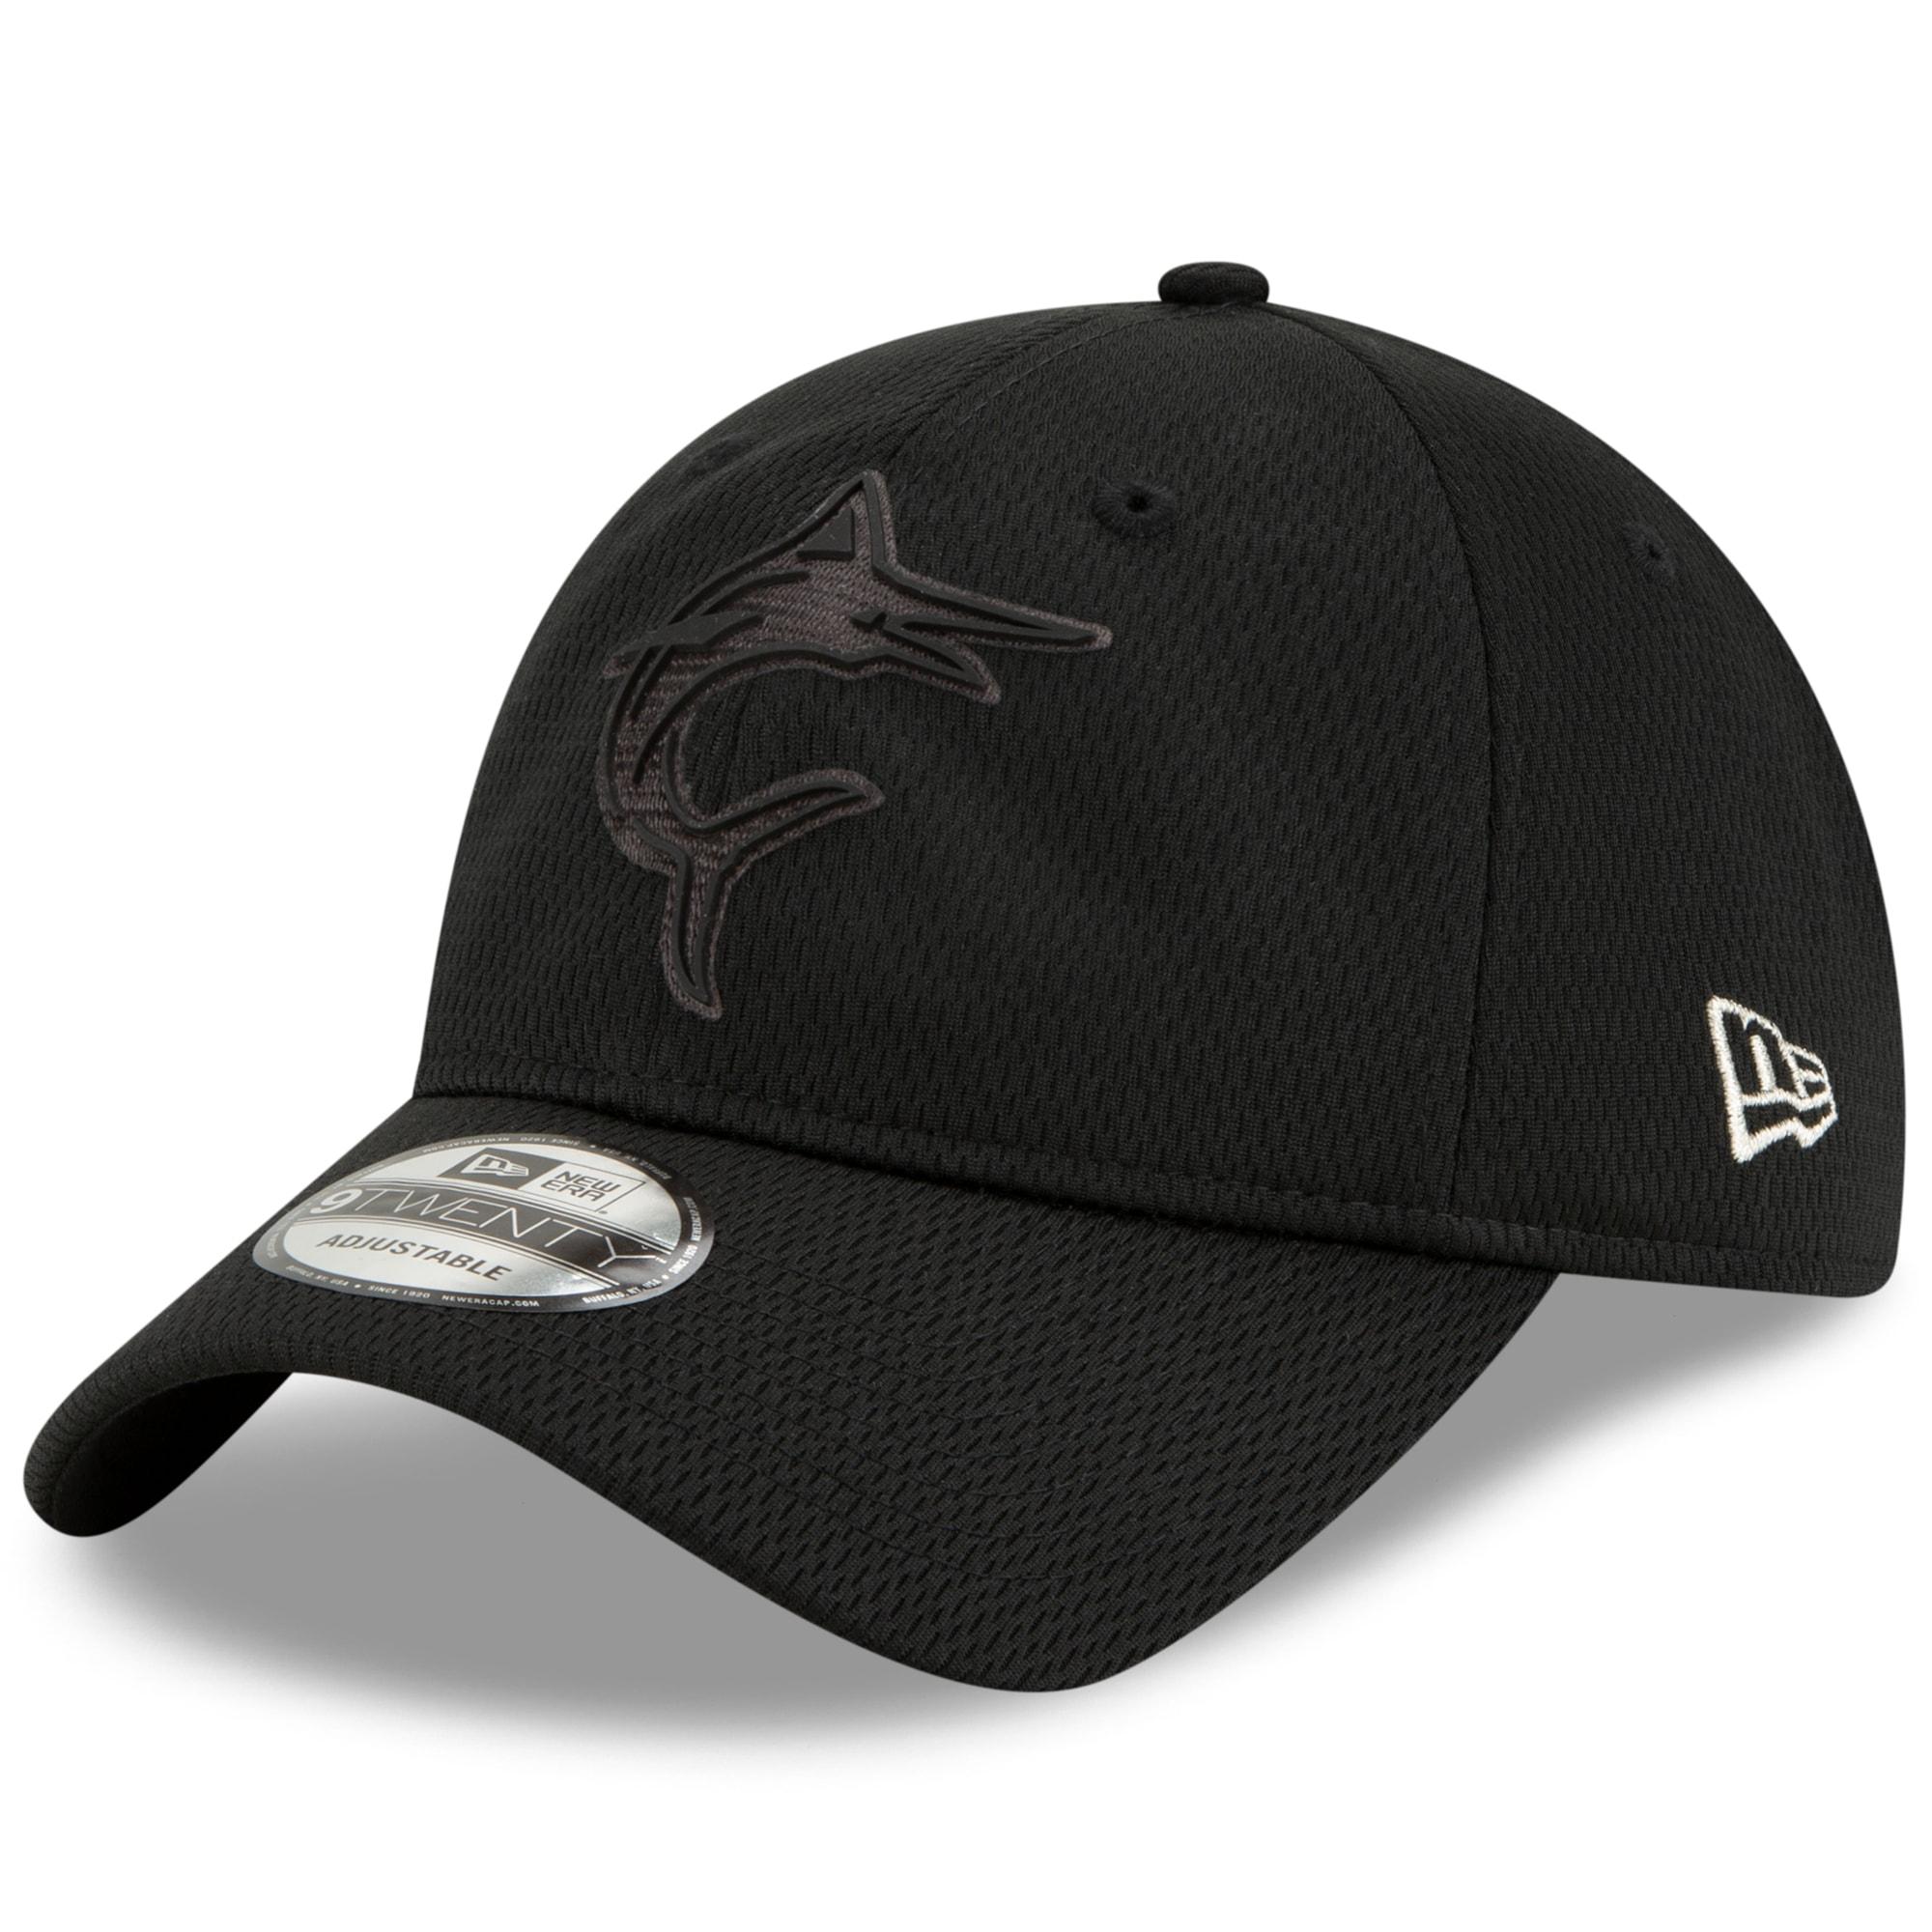 Miami Marlins New Era 2019 Players' Weekend 9TWENTY Adjustable Hat - Black